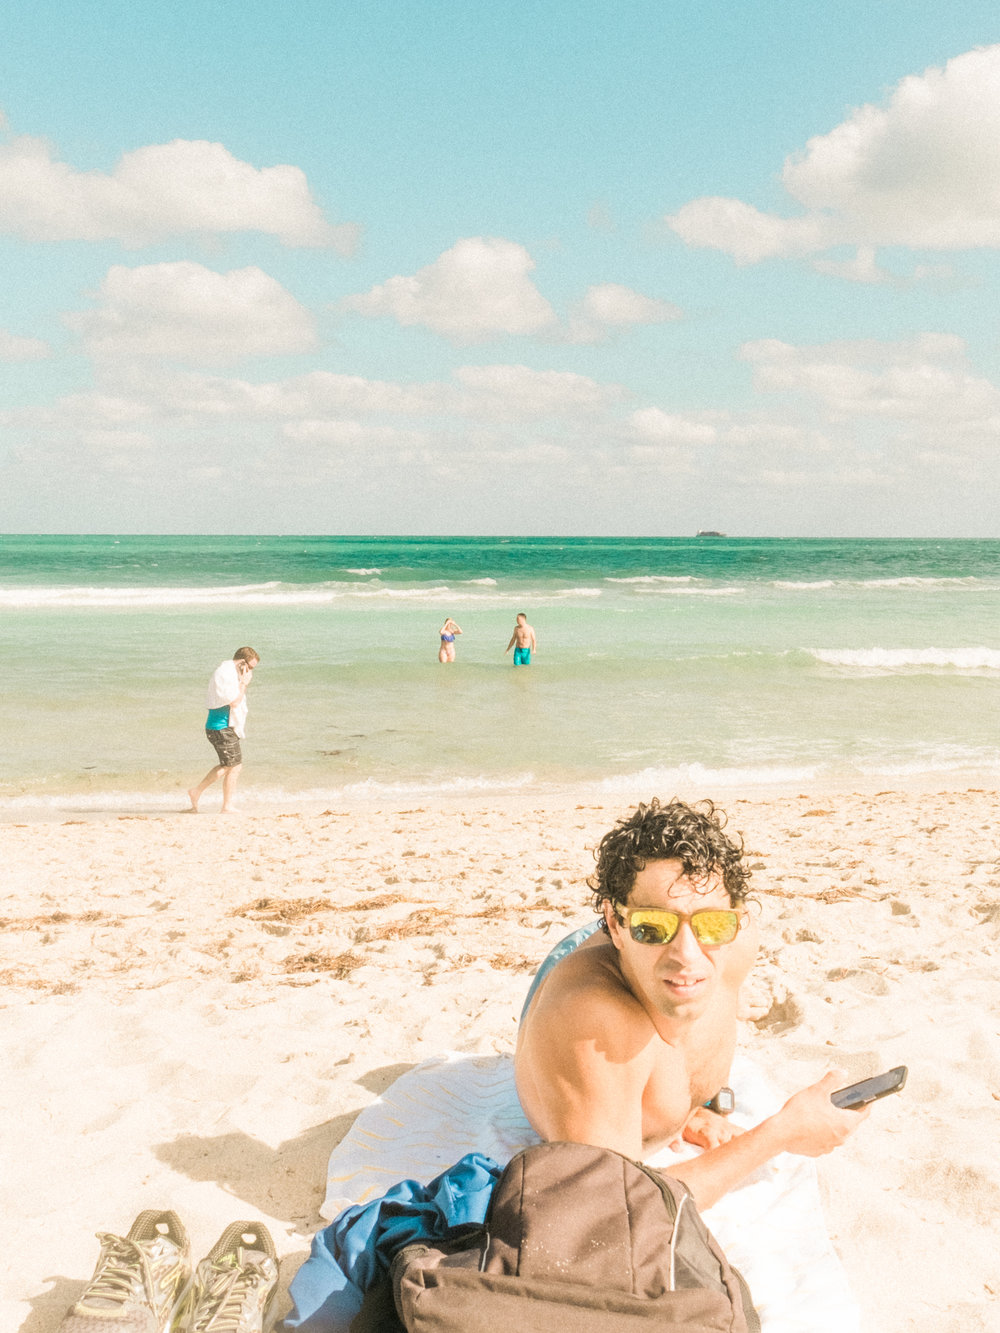 Miami_Beach_Street_85.jpg